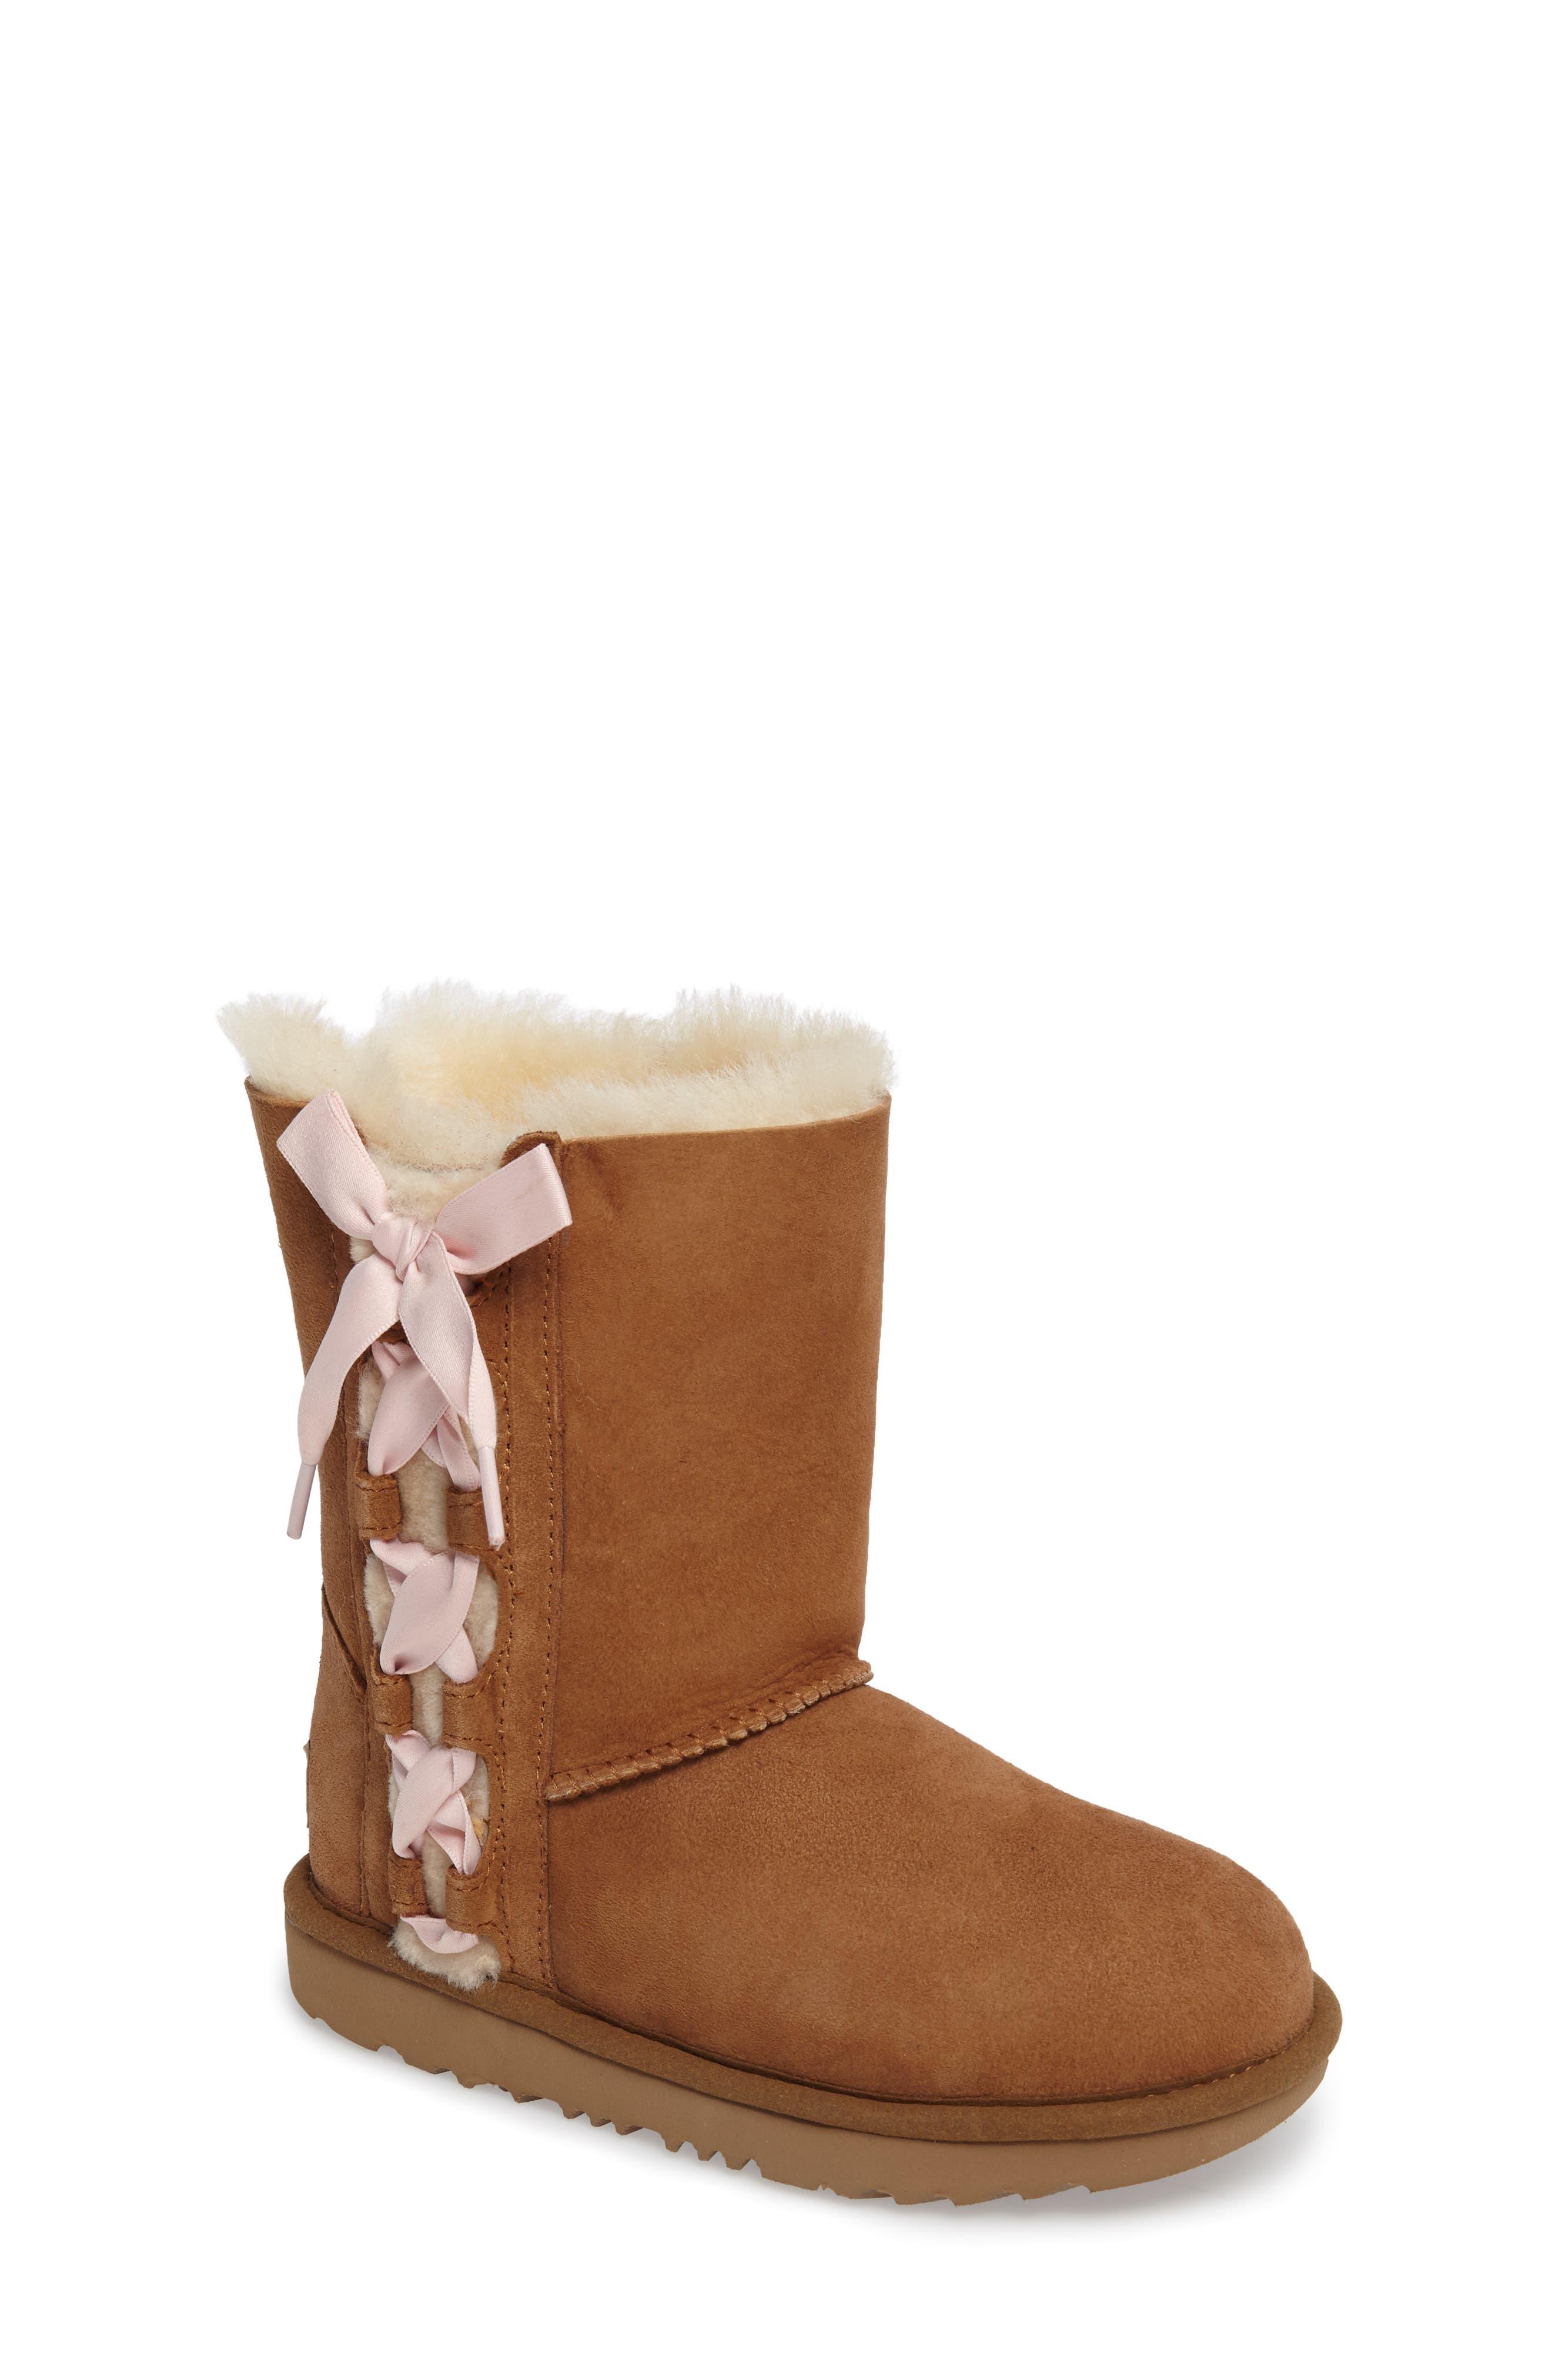 UGG® Pala Water-Resistant Genuine Shearling Boot (Walker, Toddler, Little Kid & Big Kid)